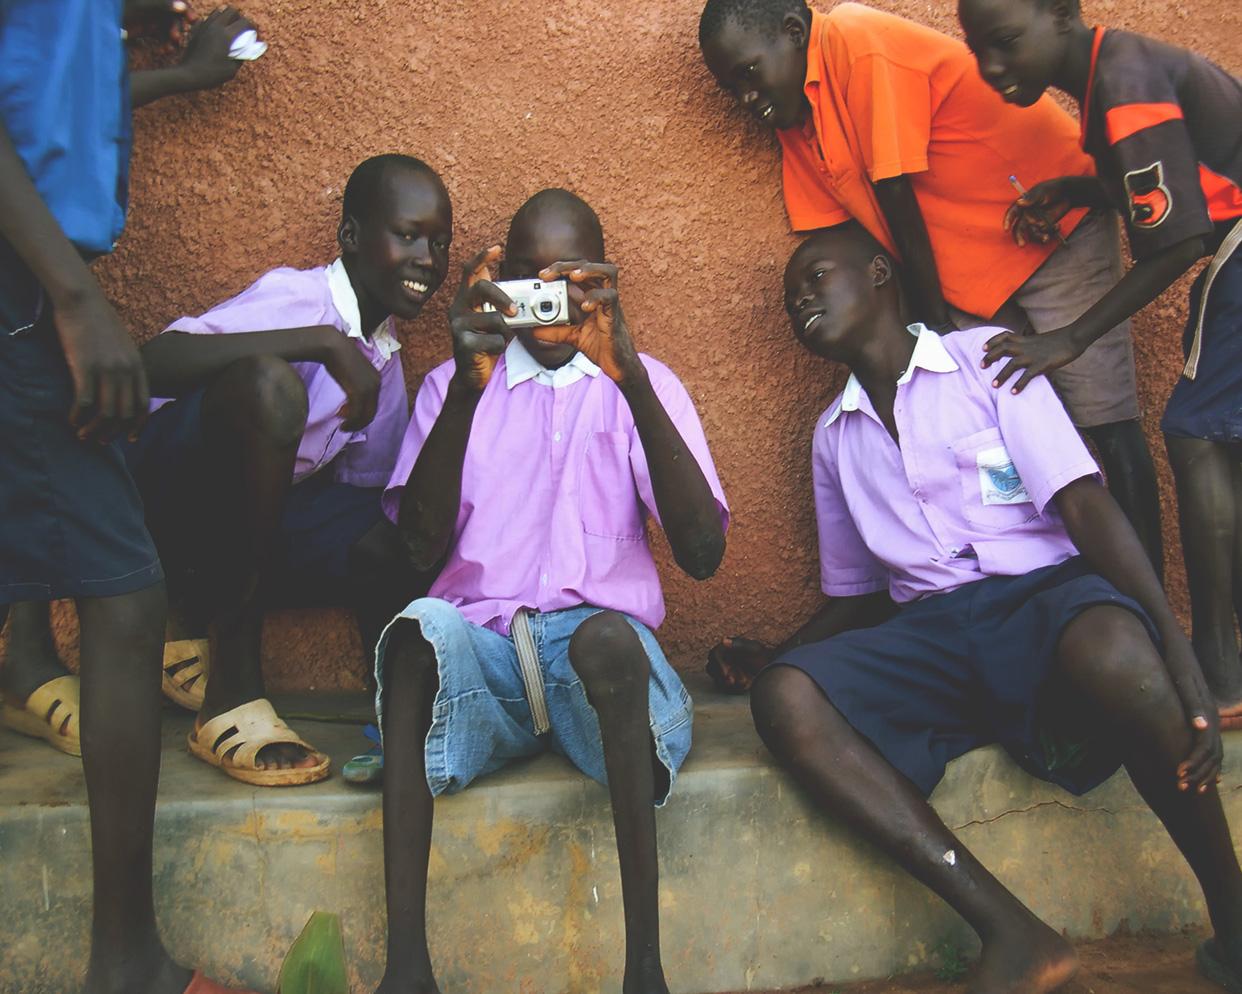 sudan-children-camera.jpg